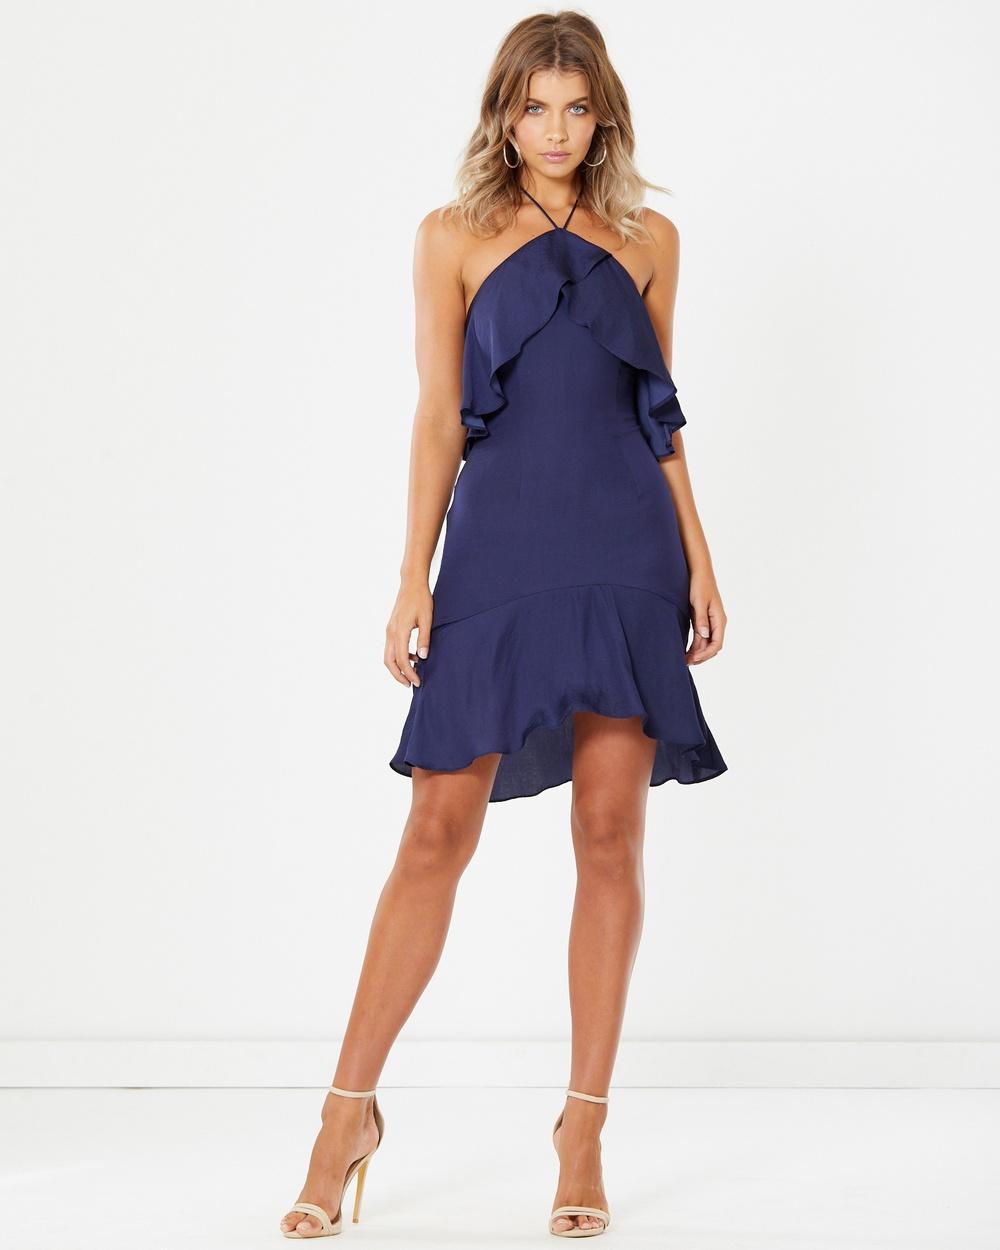 Tussah Erin Dress Dresses Navy Erin Dress